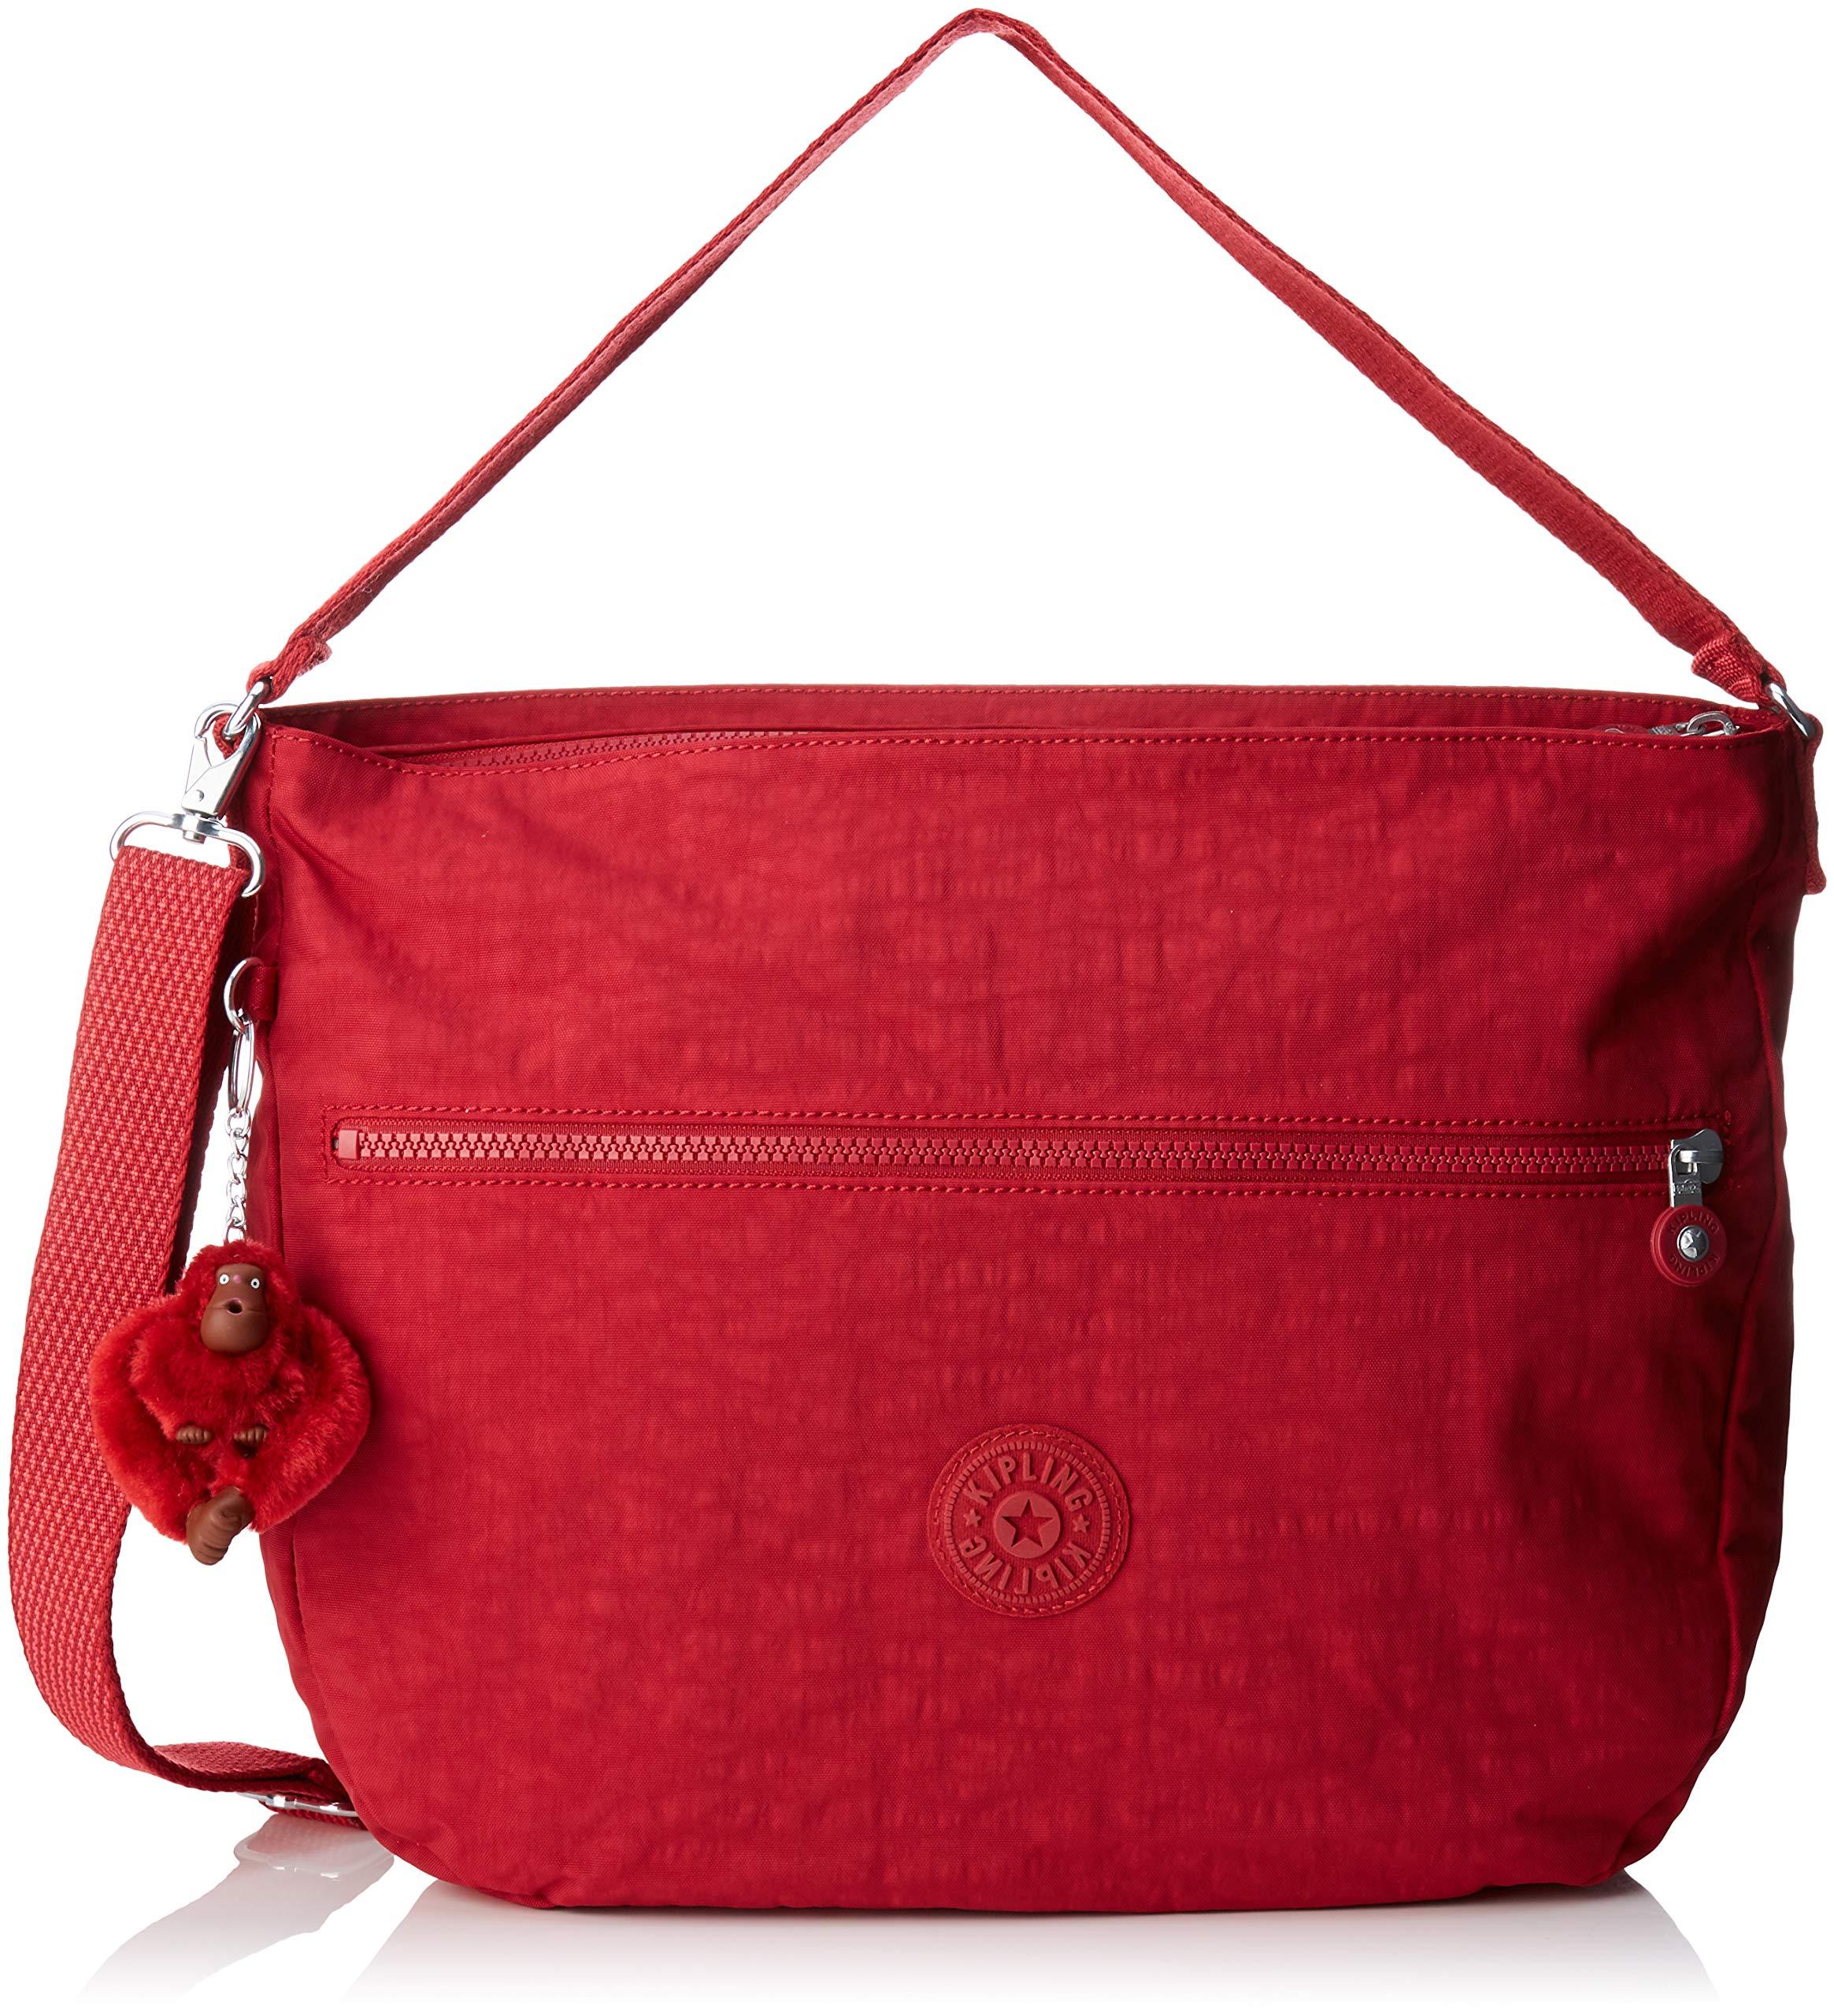 Portés Kipling H T Épaule Red X Cmb 5x37x31 FennaSacs C9 FemmeRougeradiant Nvn0Om8w